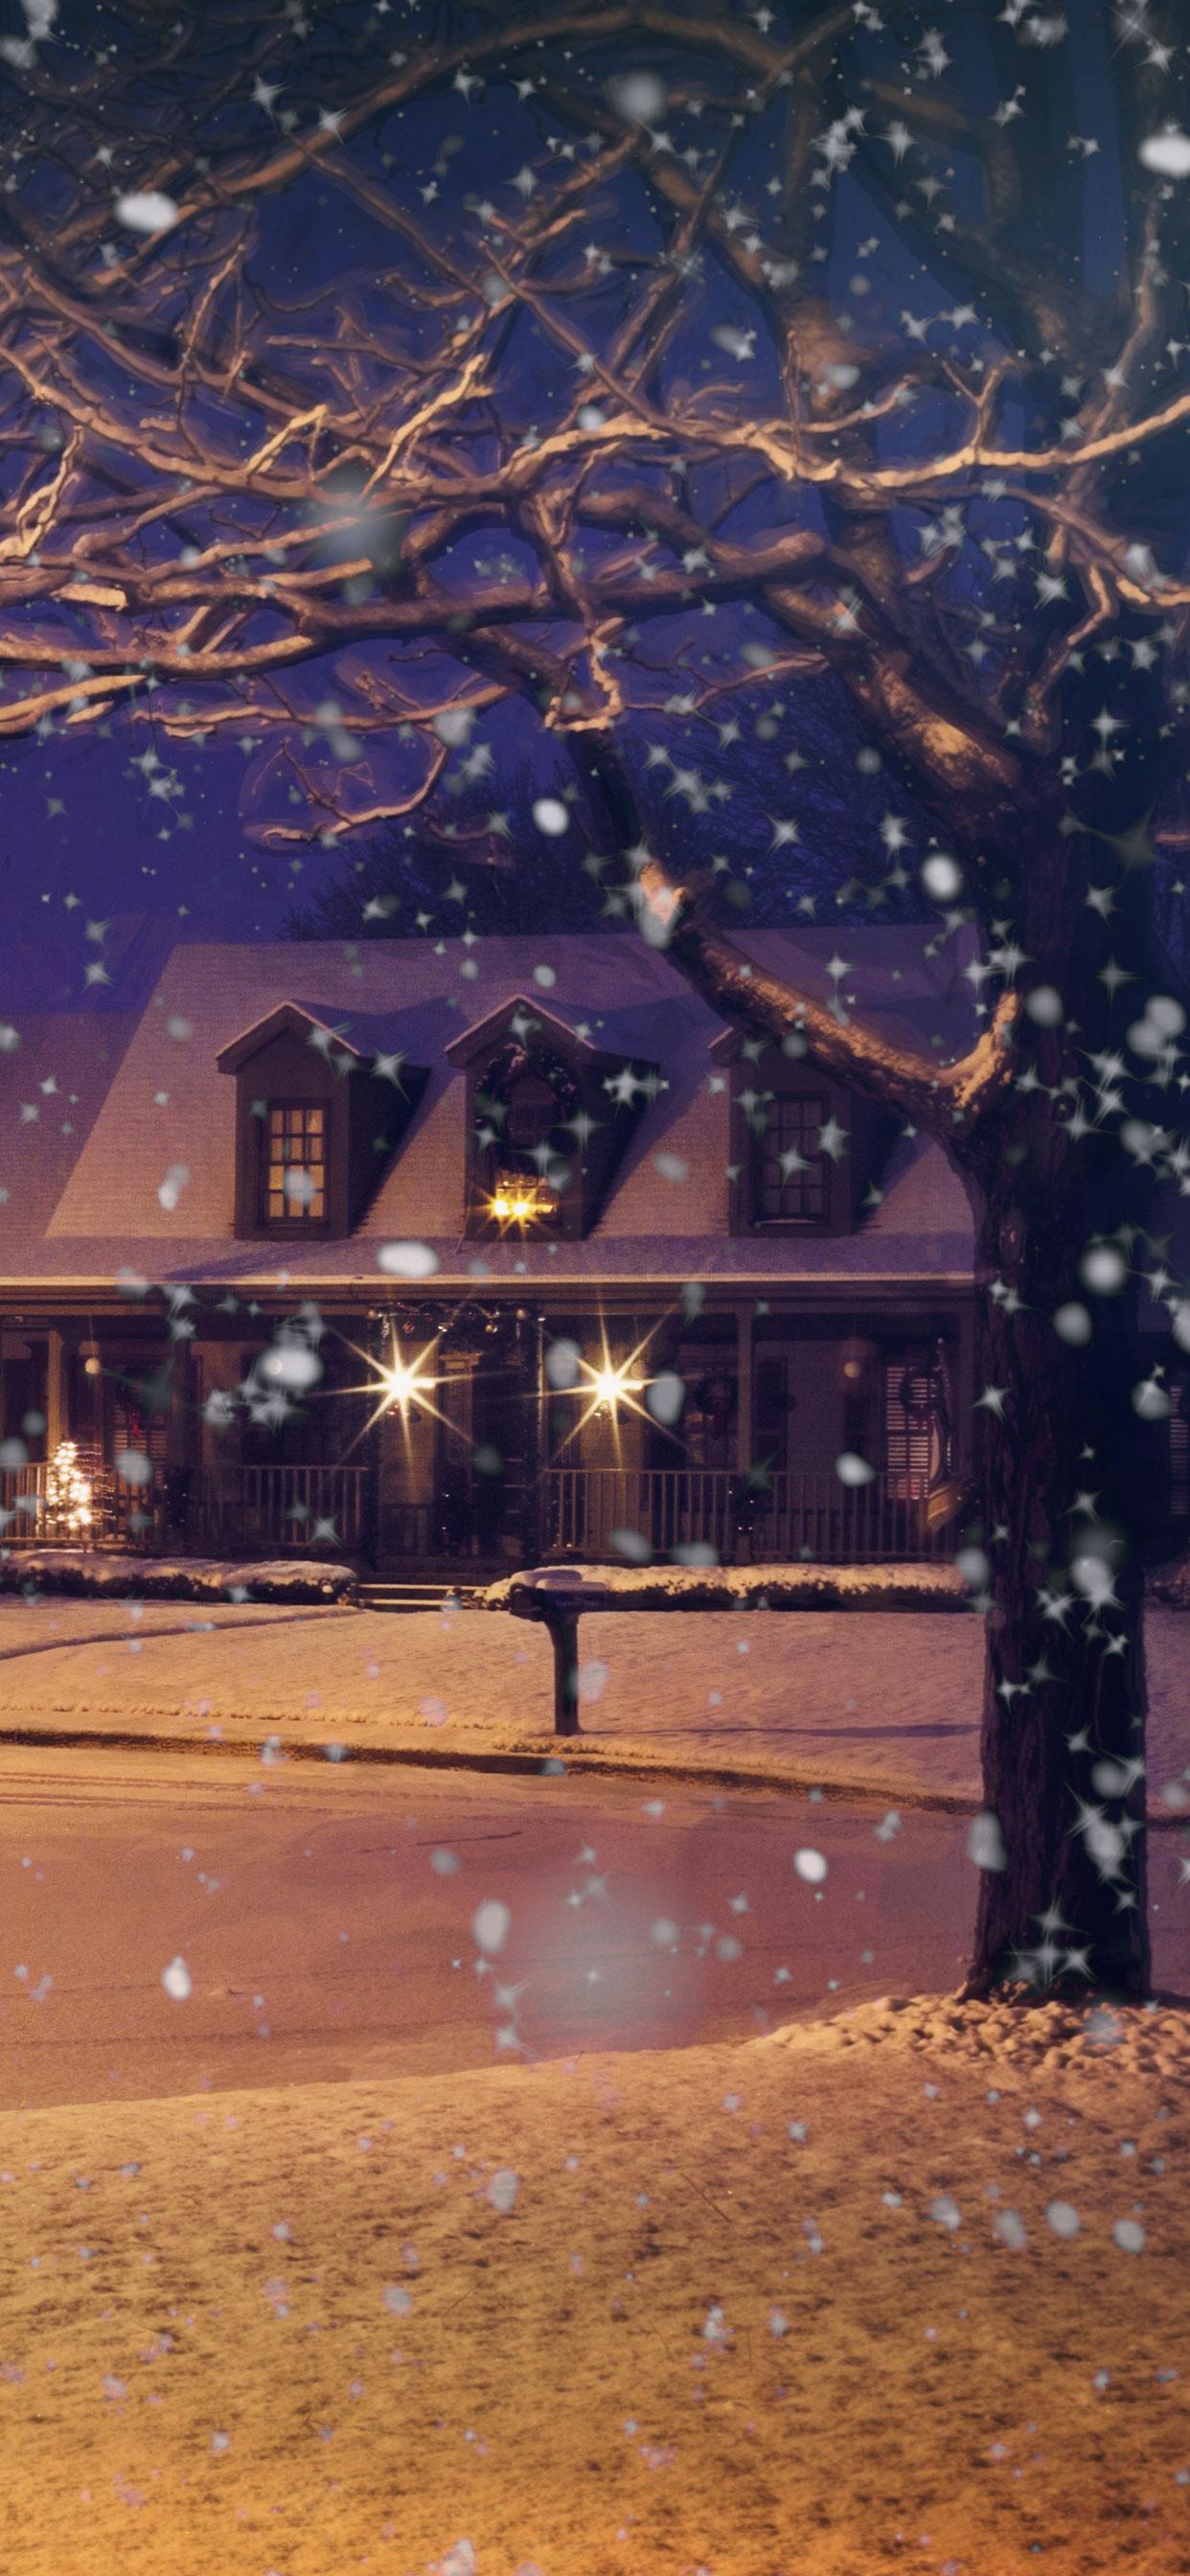 30 Beautiful IPhone Xs Amp Xs Max Christmas Wallpapers